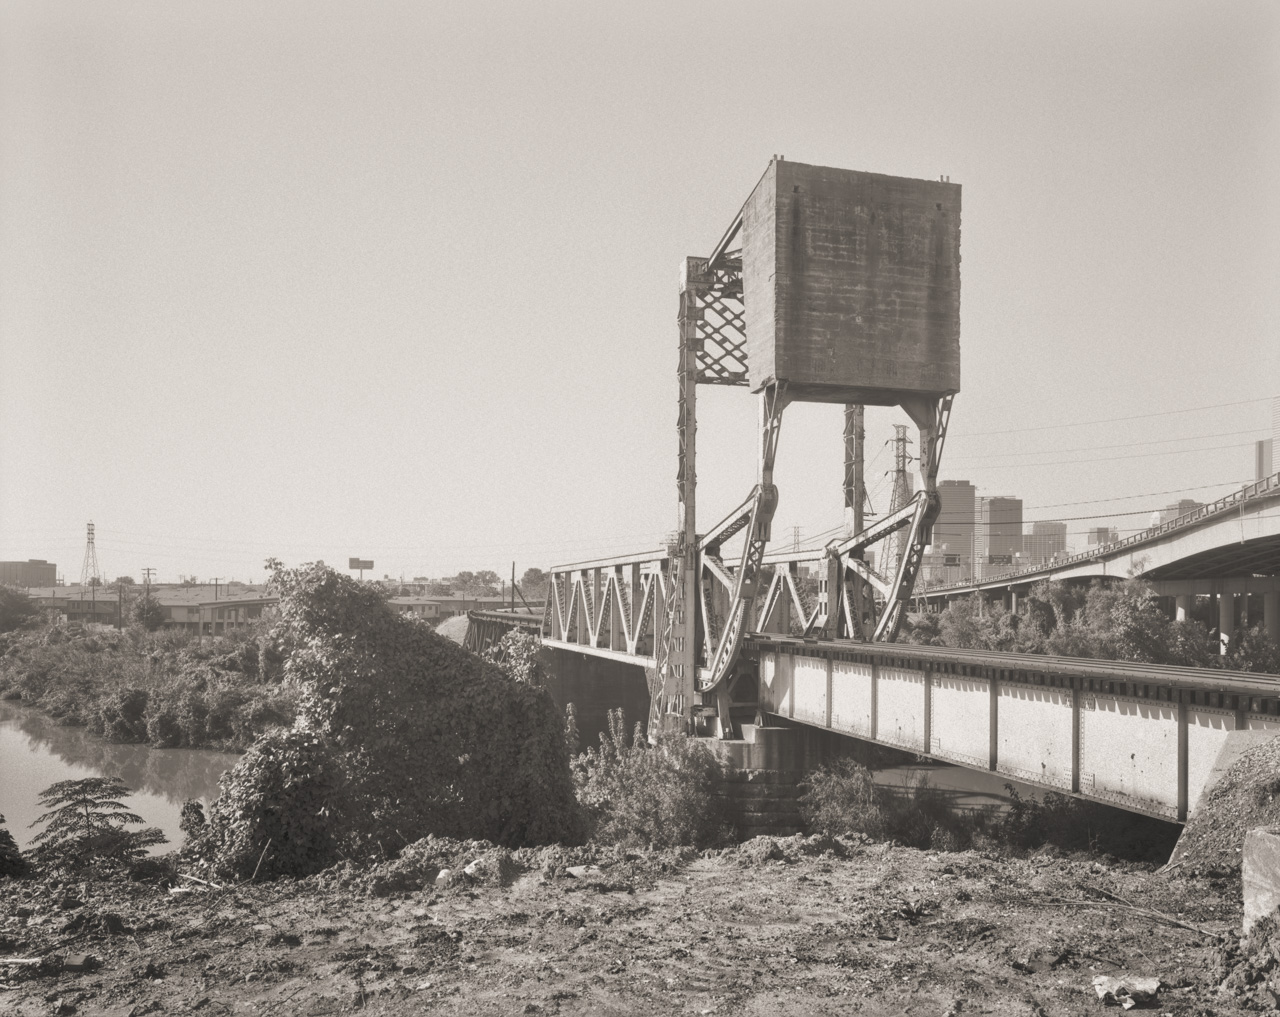 015 Bascule & Trunnion Bridge, 1911 FLAT